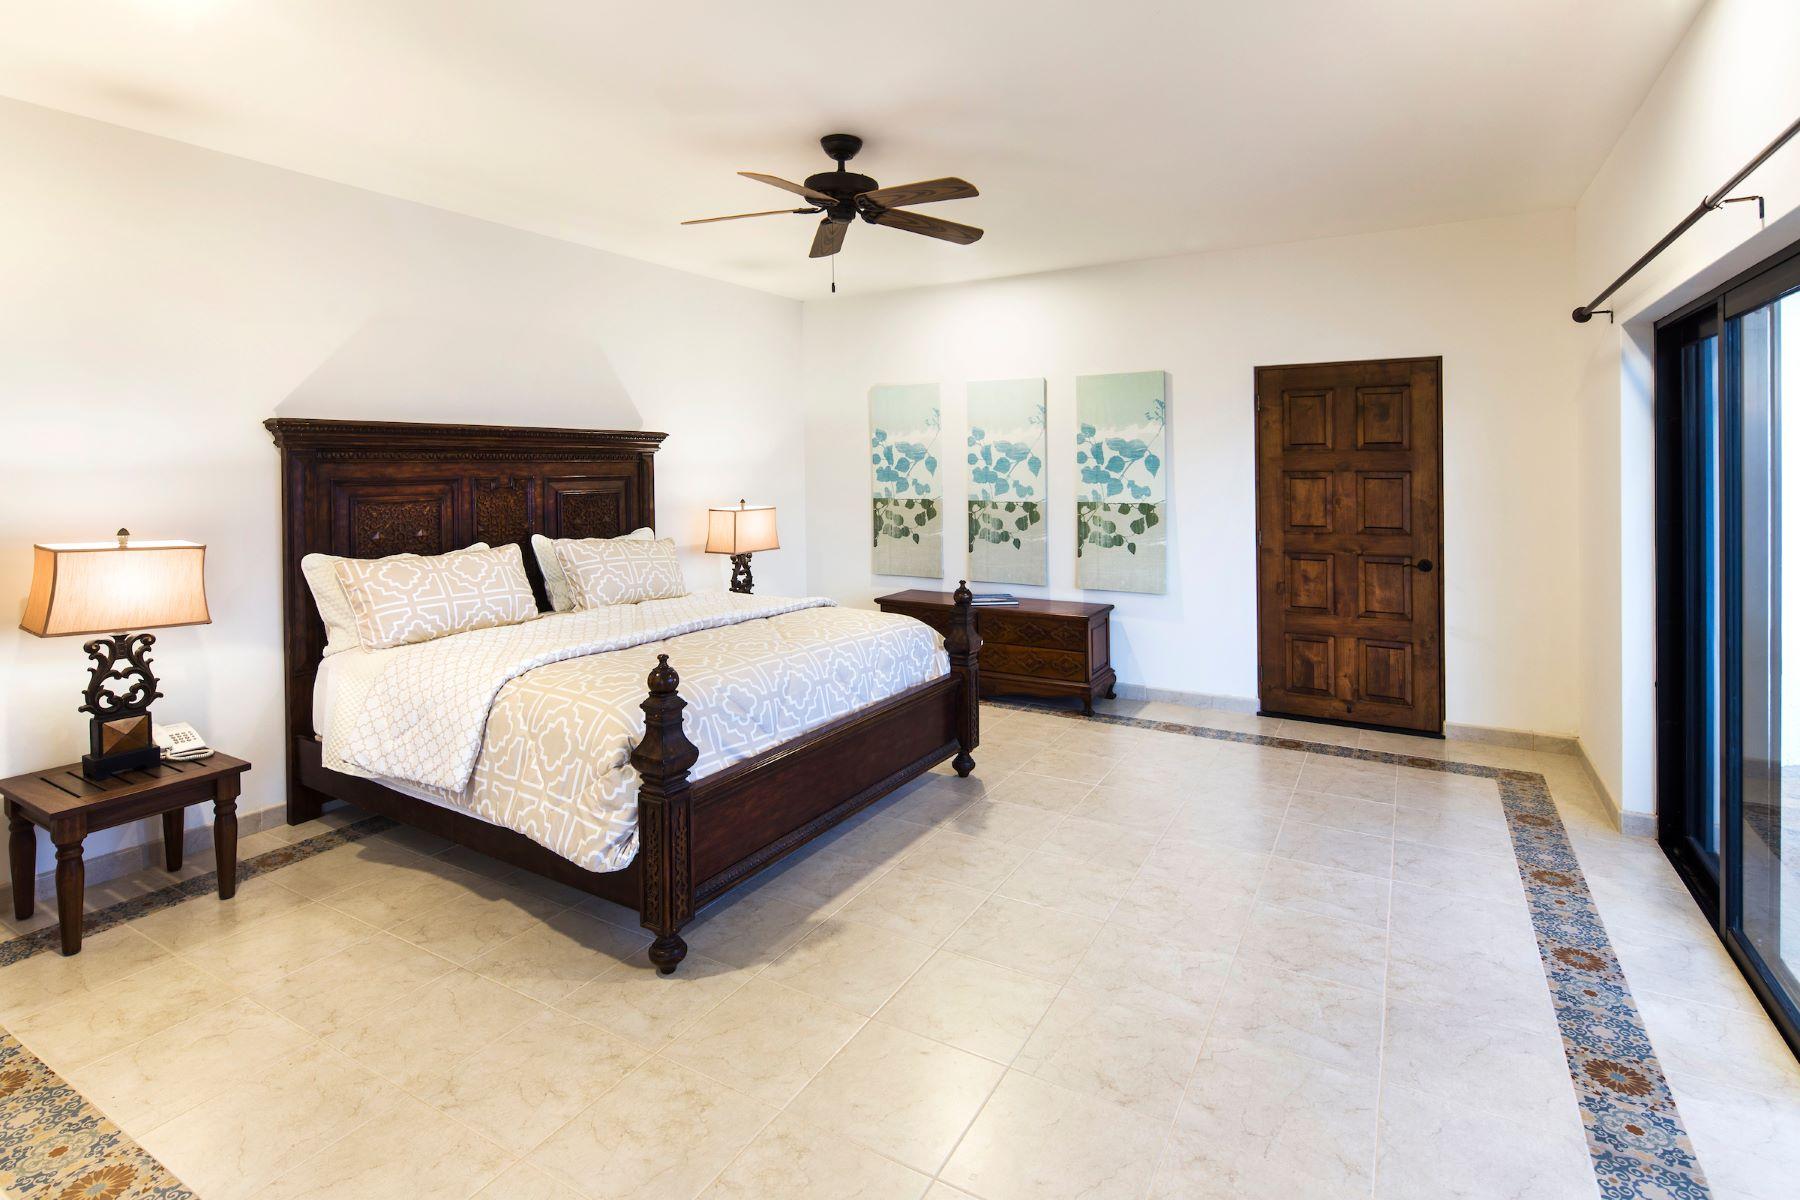 Additional photo for property listing at Casa La Favorita Other Baja California Sur, Baja California Sur México